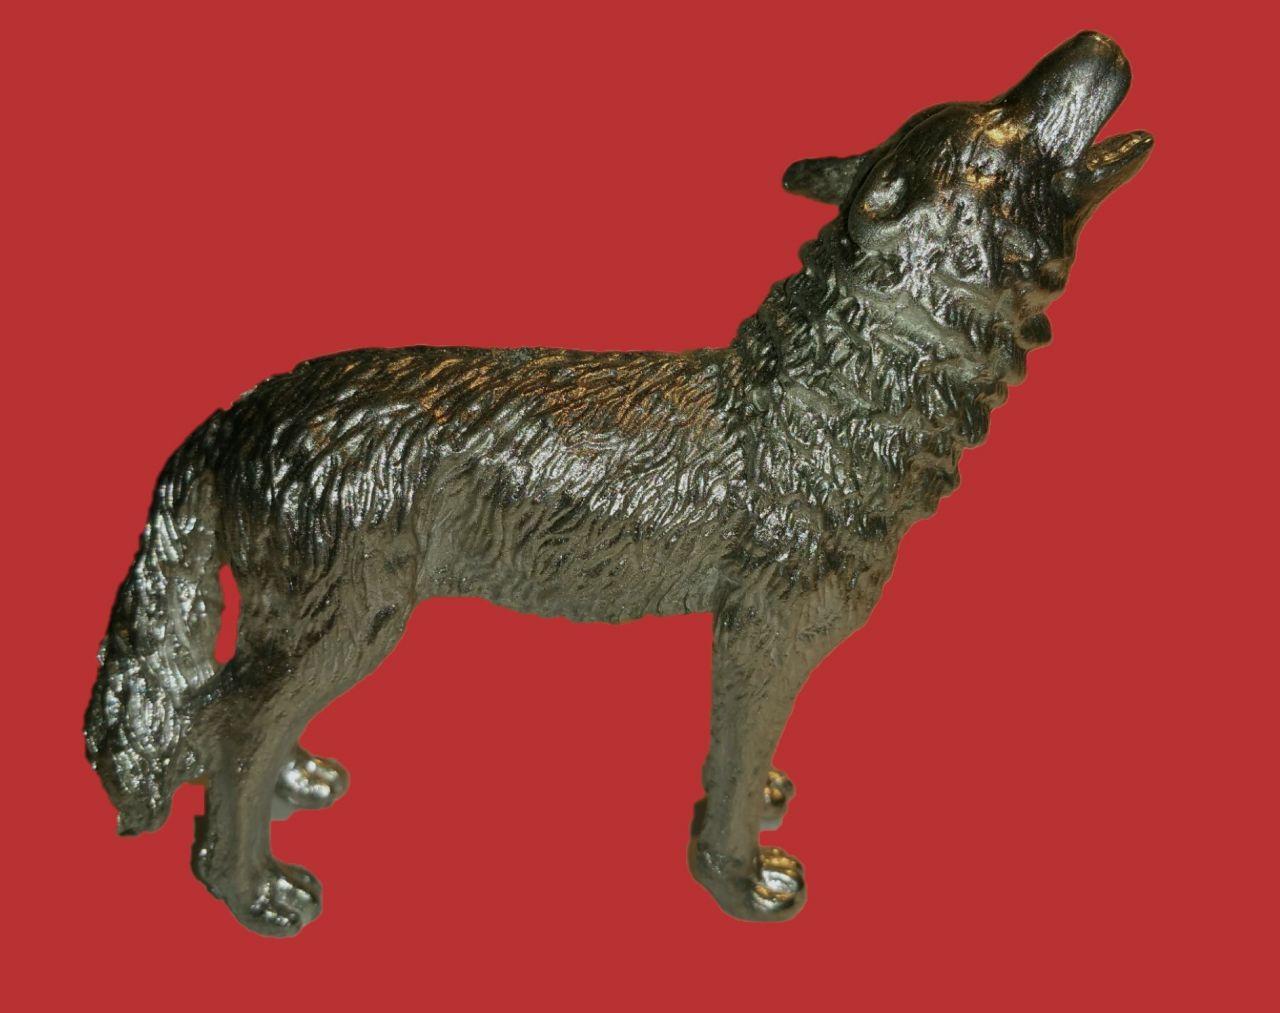 Zinngießform Heulender Wolf, ca. 280g Reinzinn